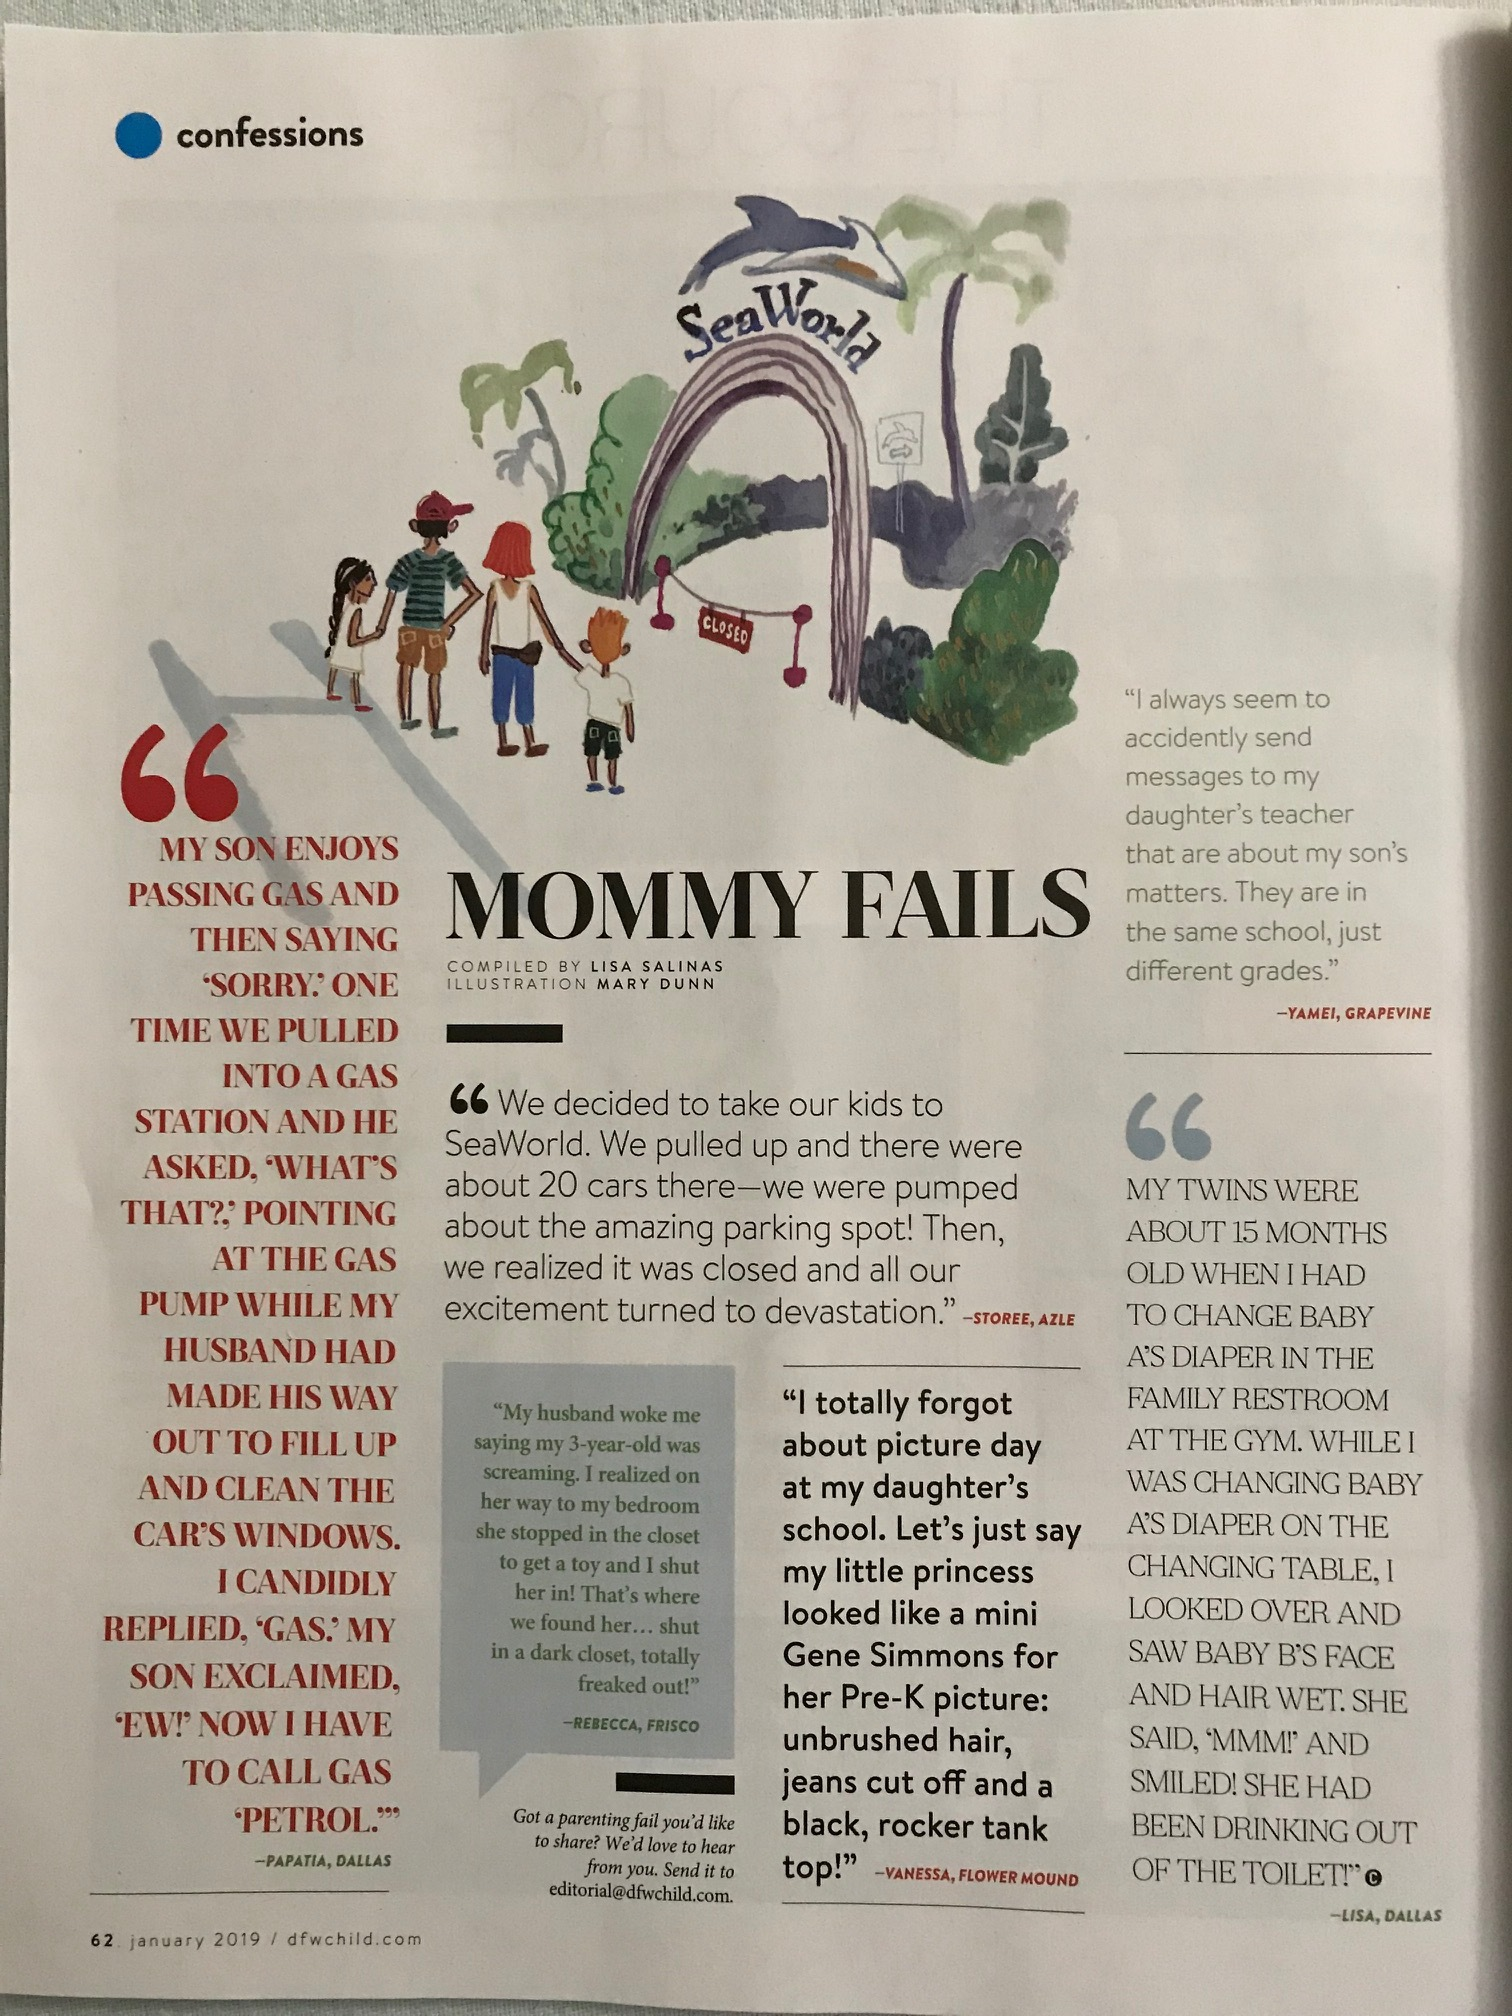 Mommy Fail Dallas Child.jpg